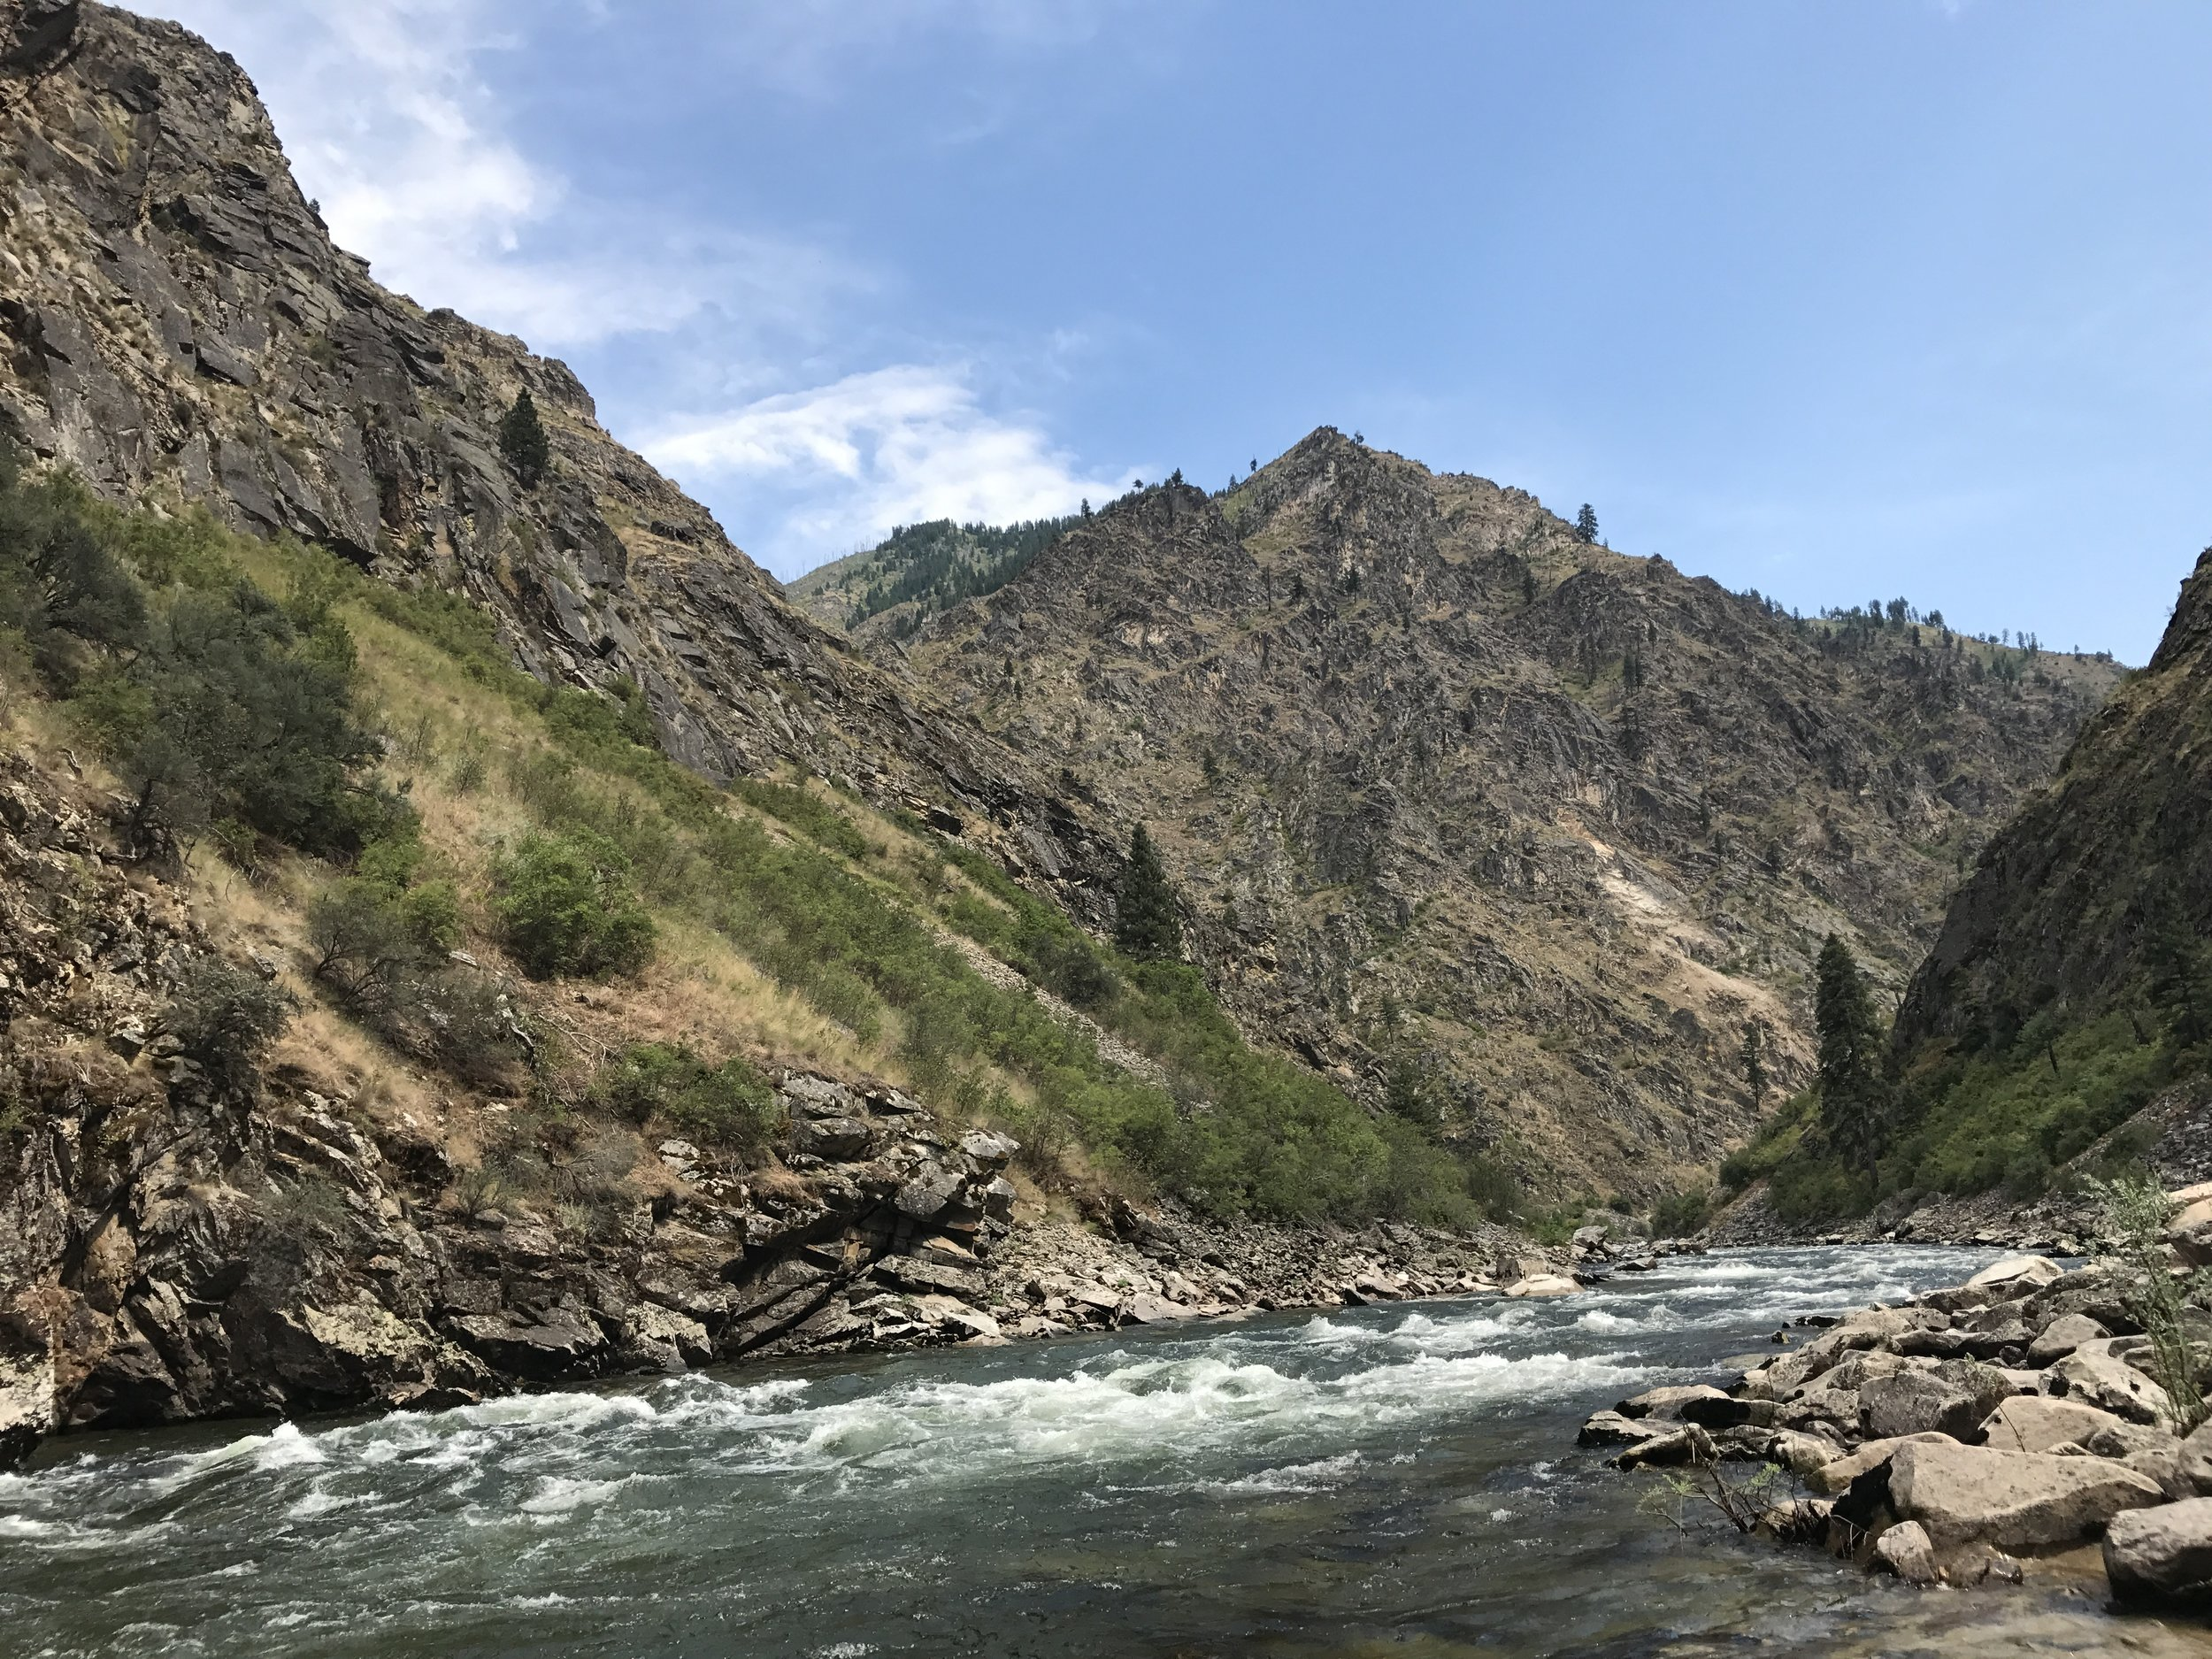 South Fork River Canyon  @Nate Ostis